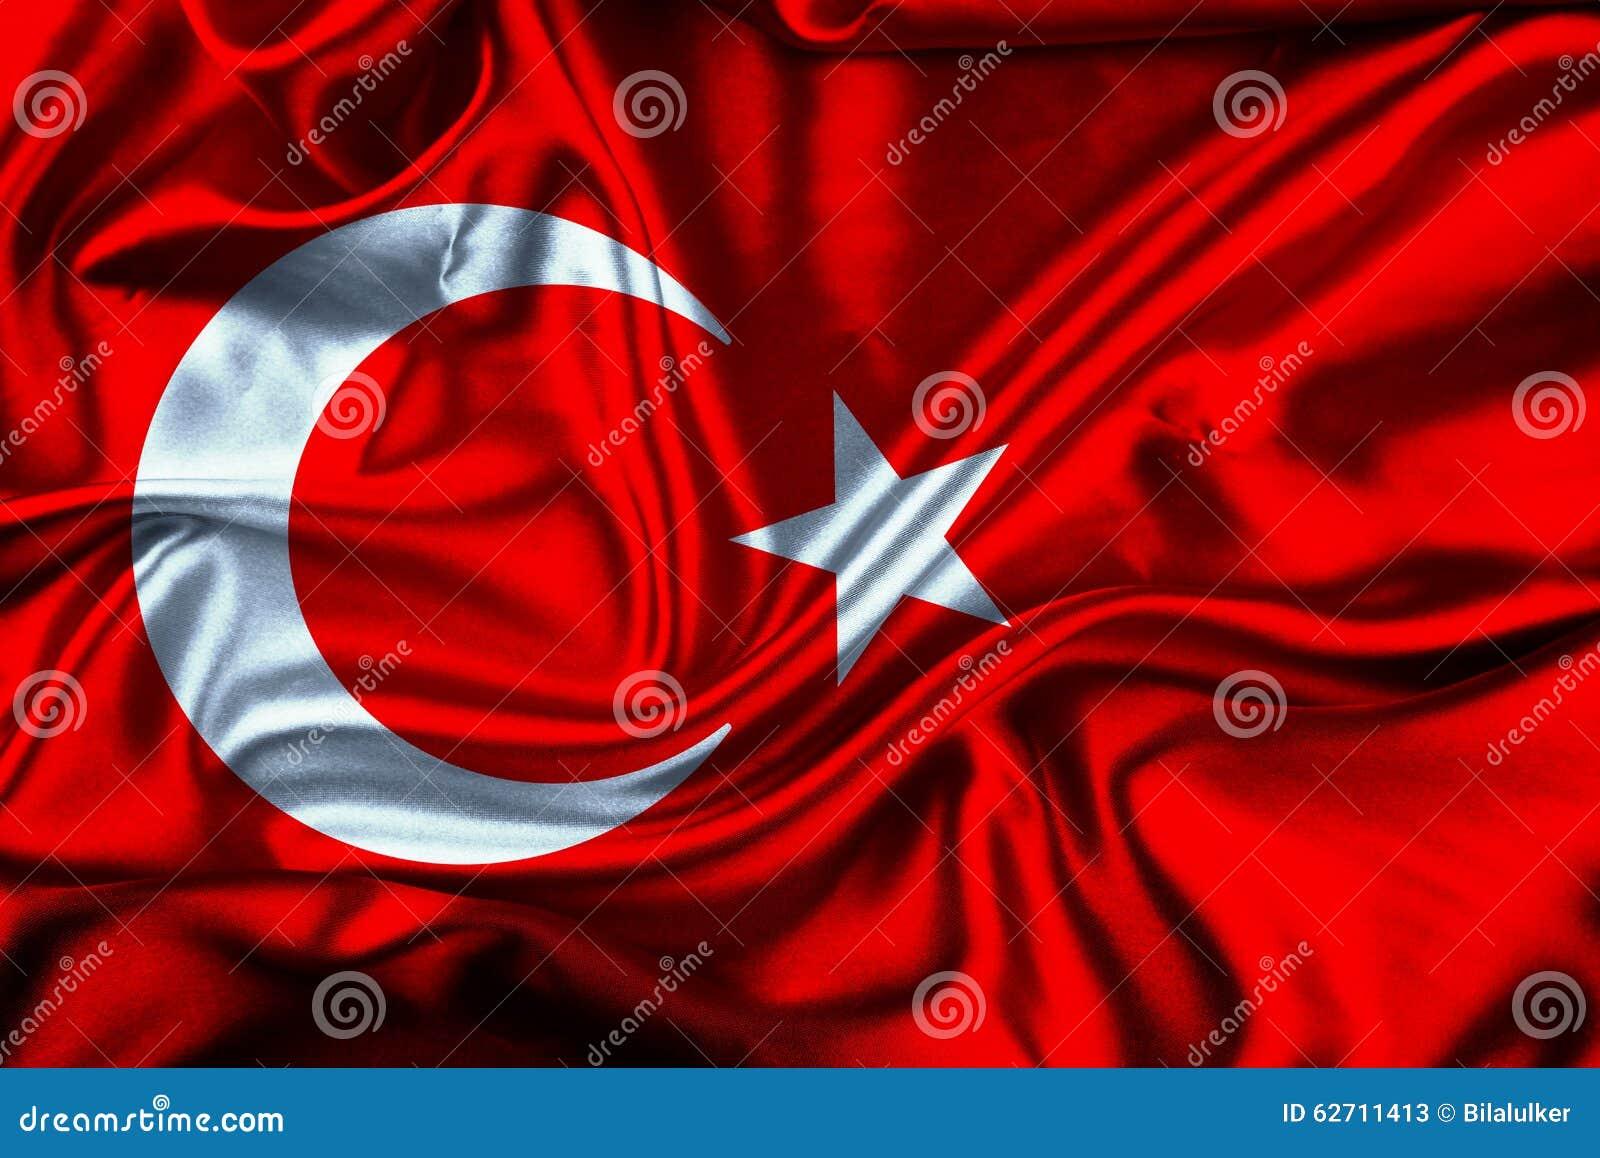 turkish flag turkey flag design stock image image of ottoman